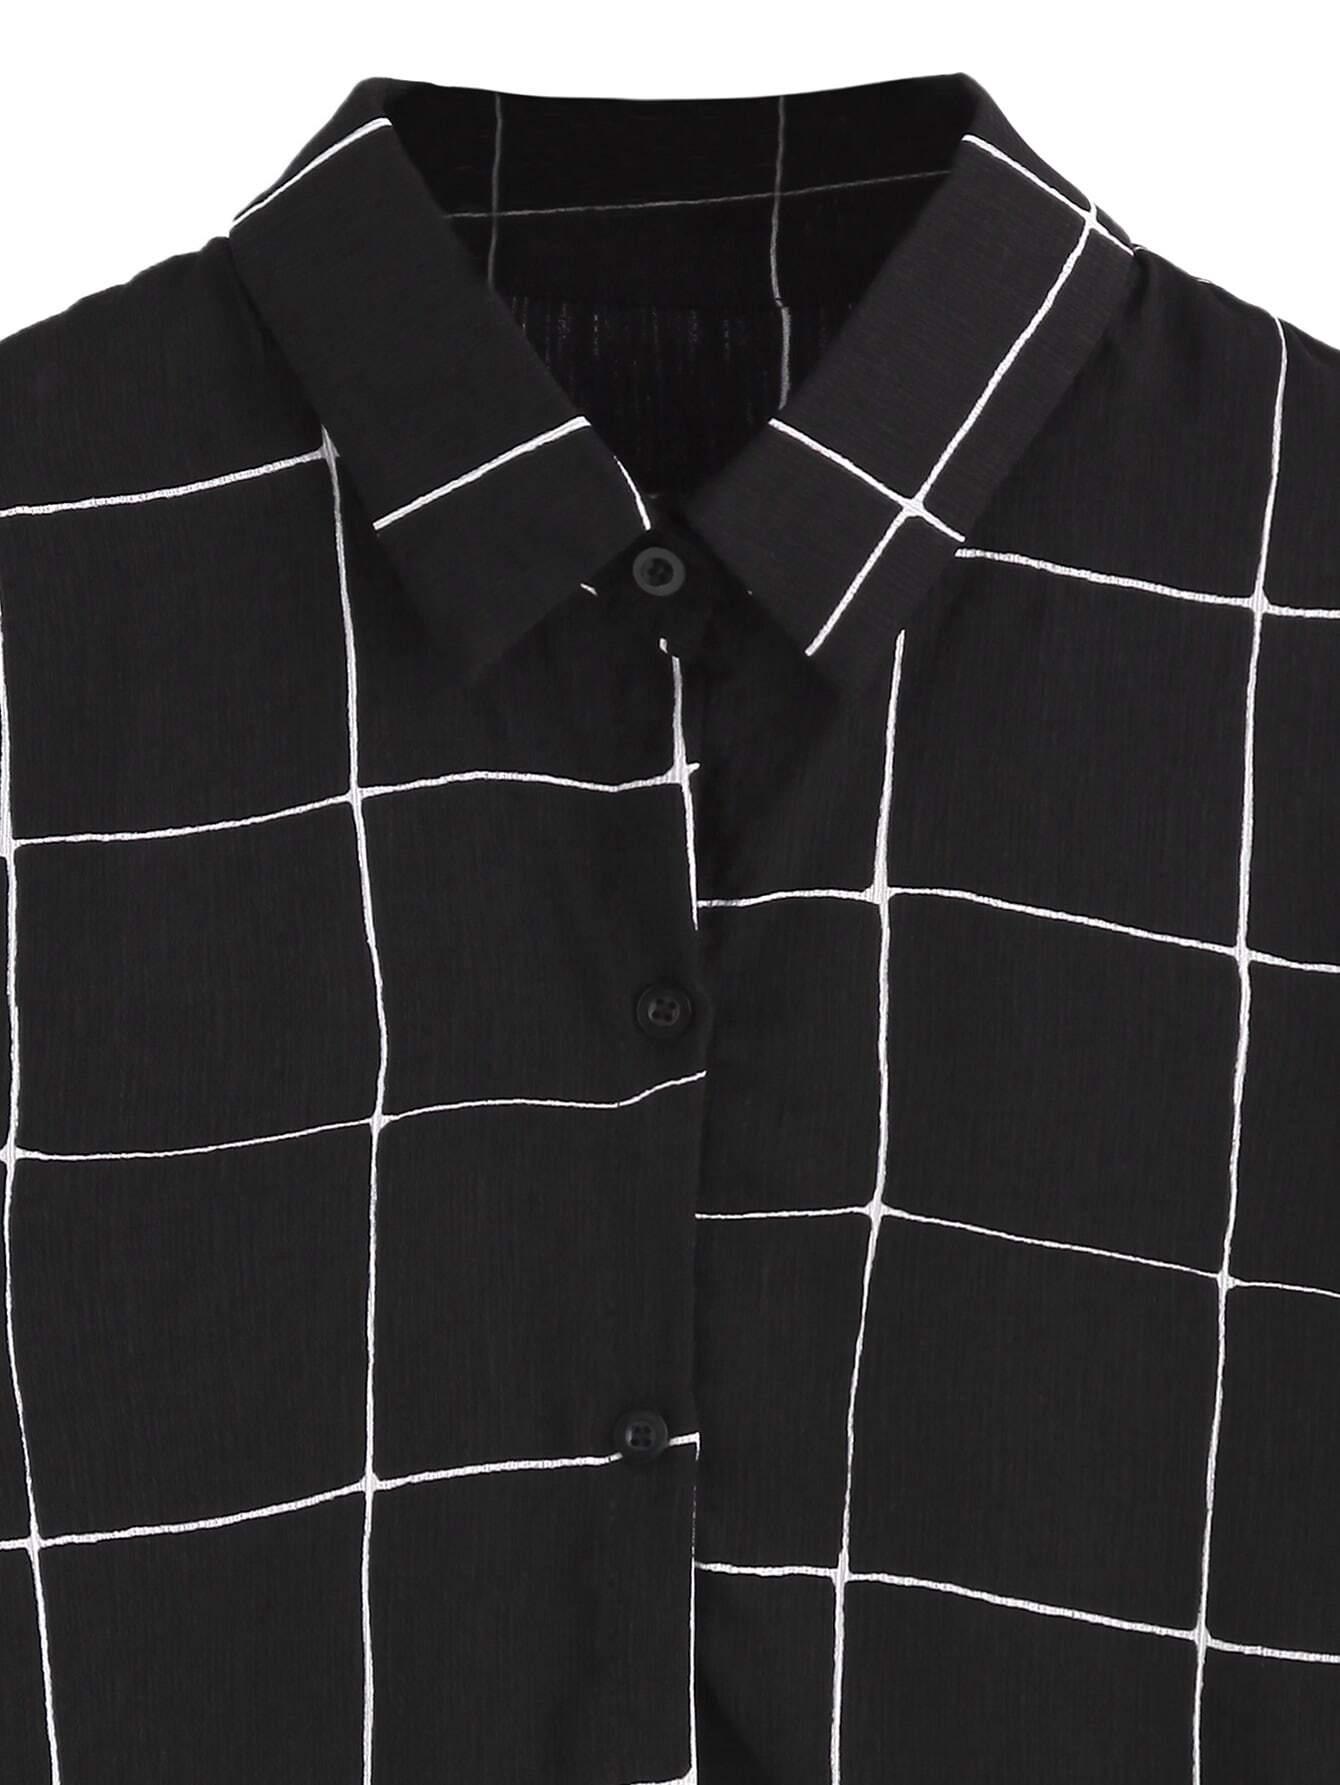 blouse160916004_2